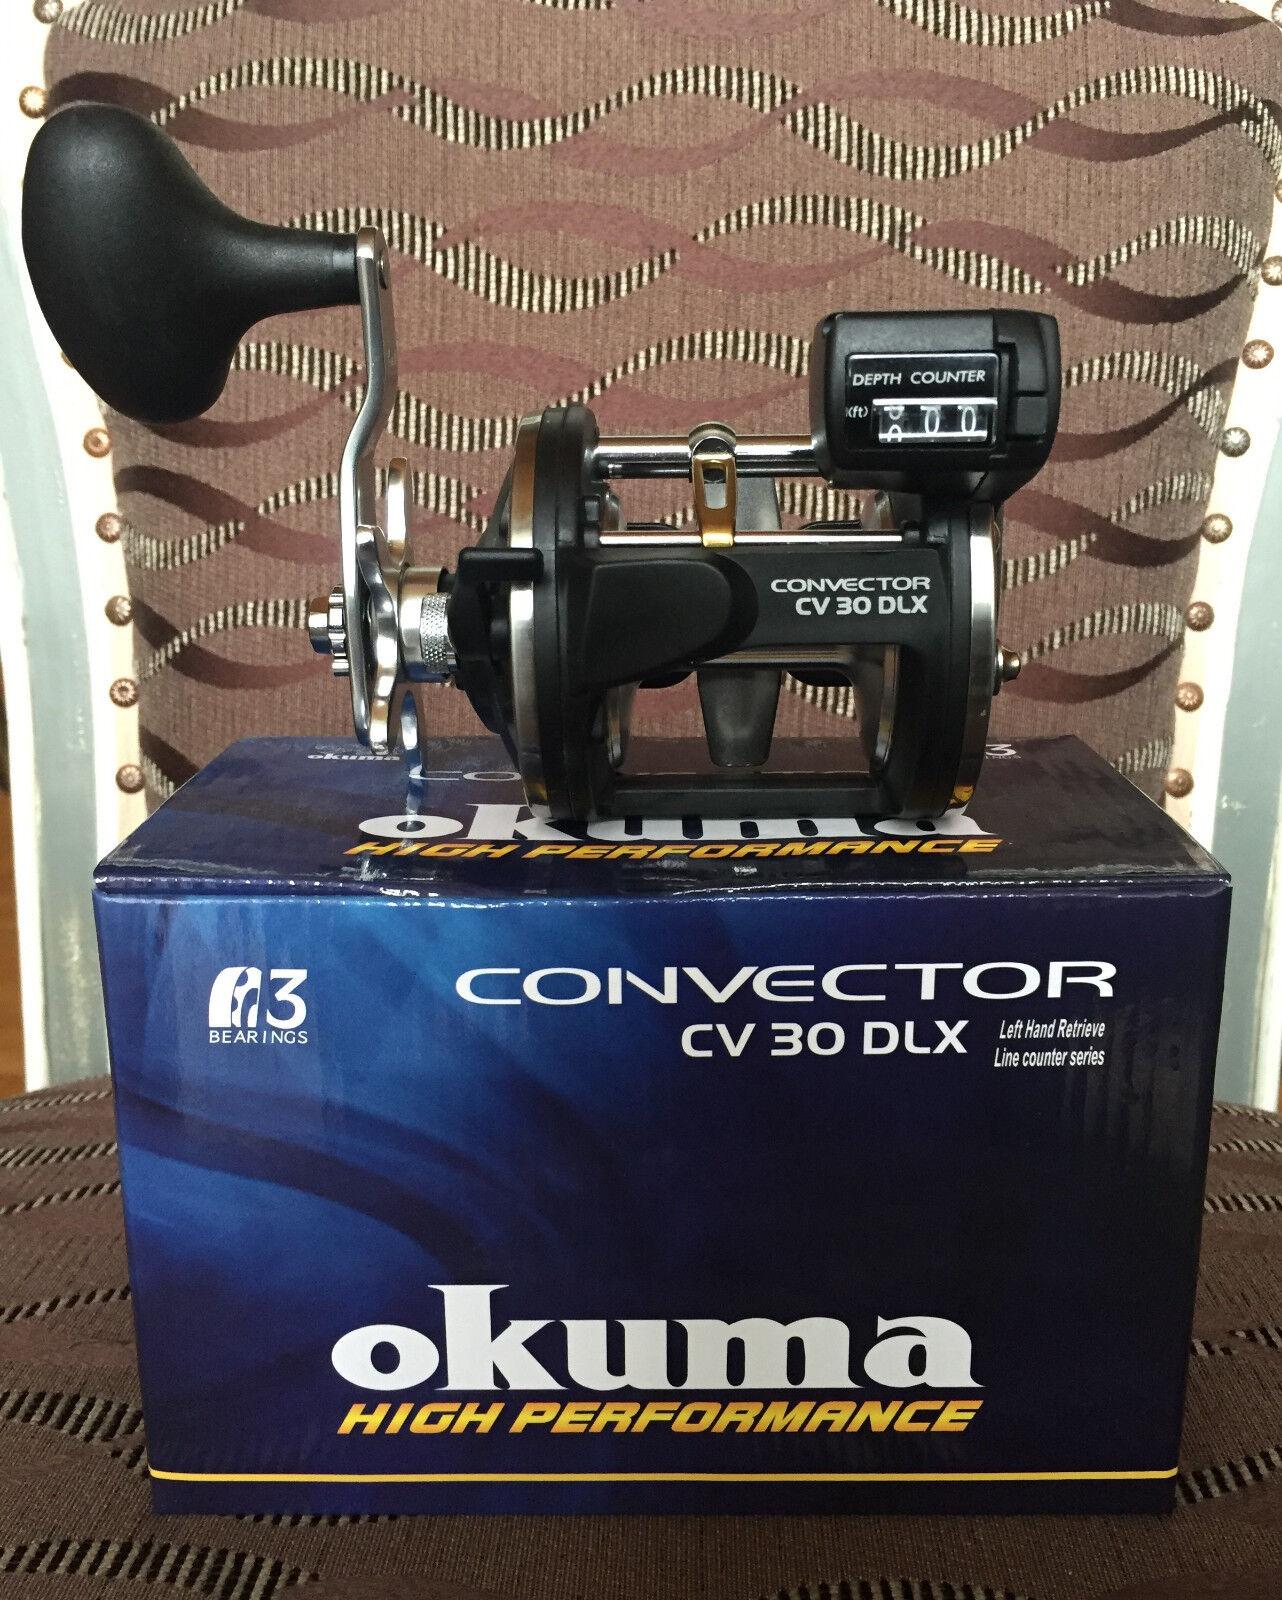 Okuma Convector CV-30DLX Linkshand  Multirolle  wholesale prices